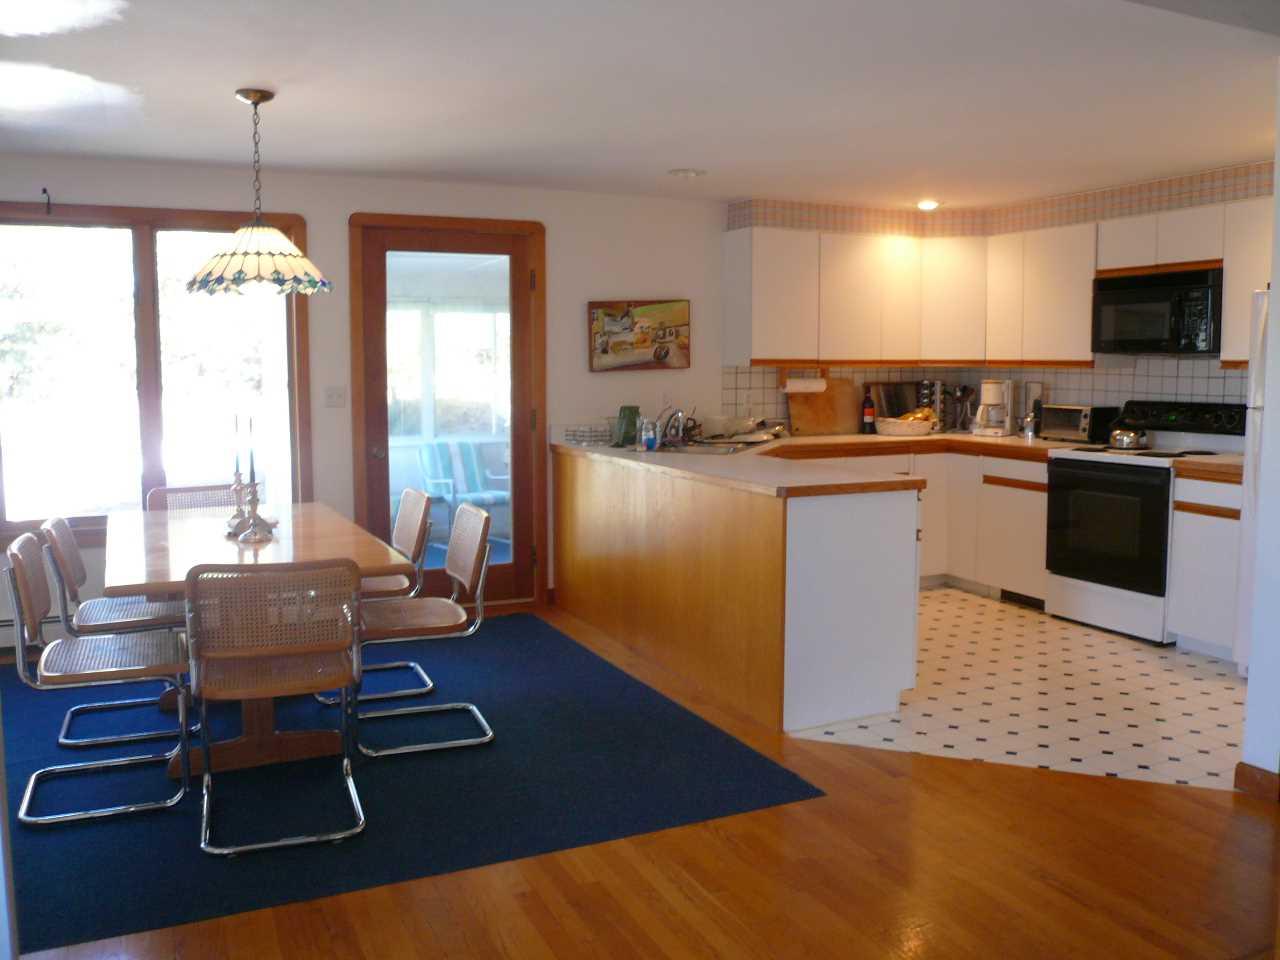 Dining Room/ Kitchen